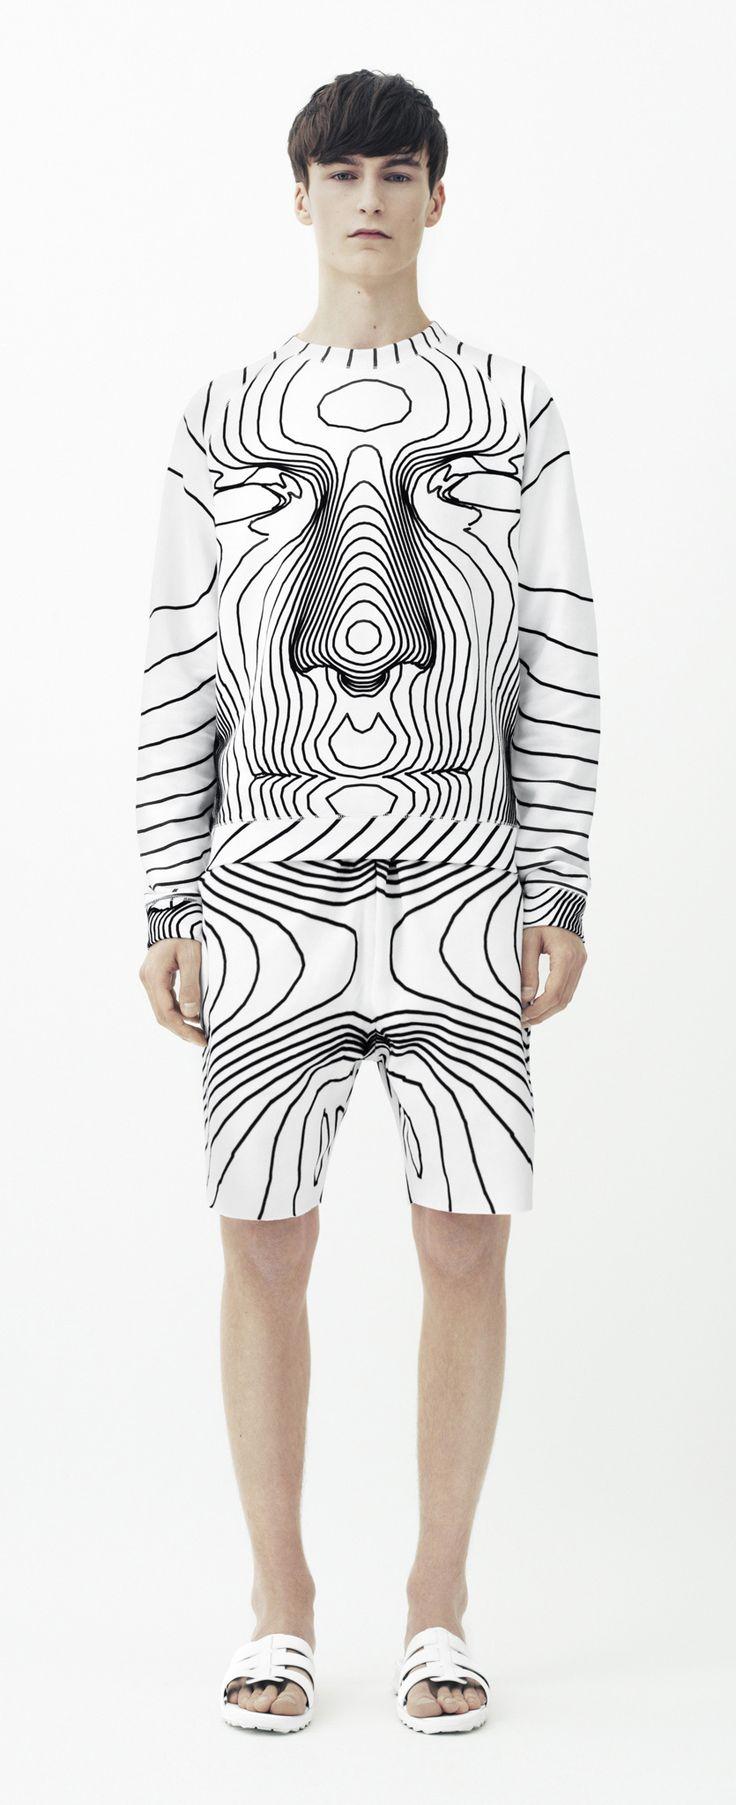 Spring 2014 Menswear - Christopher Kane black and white graphic